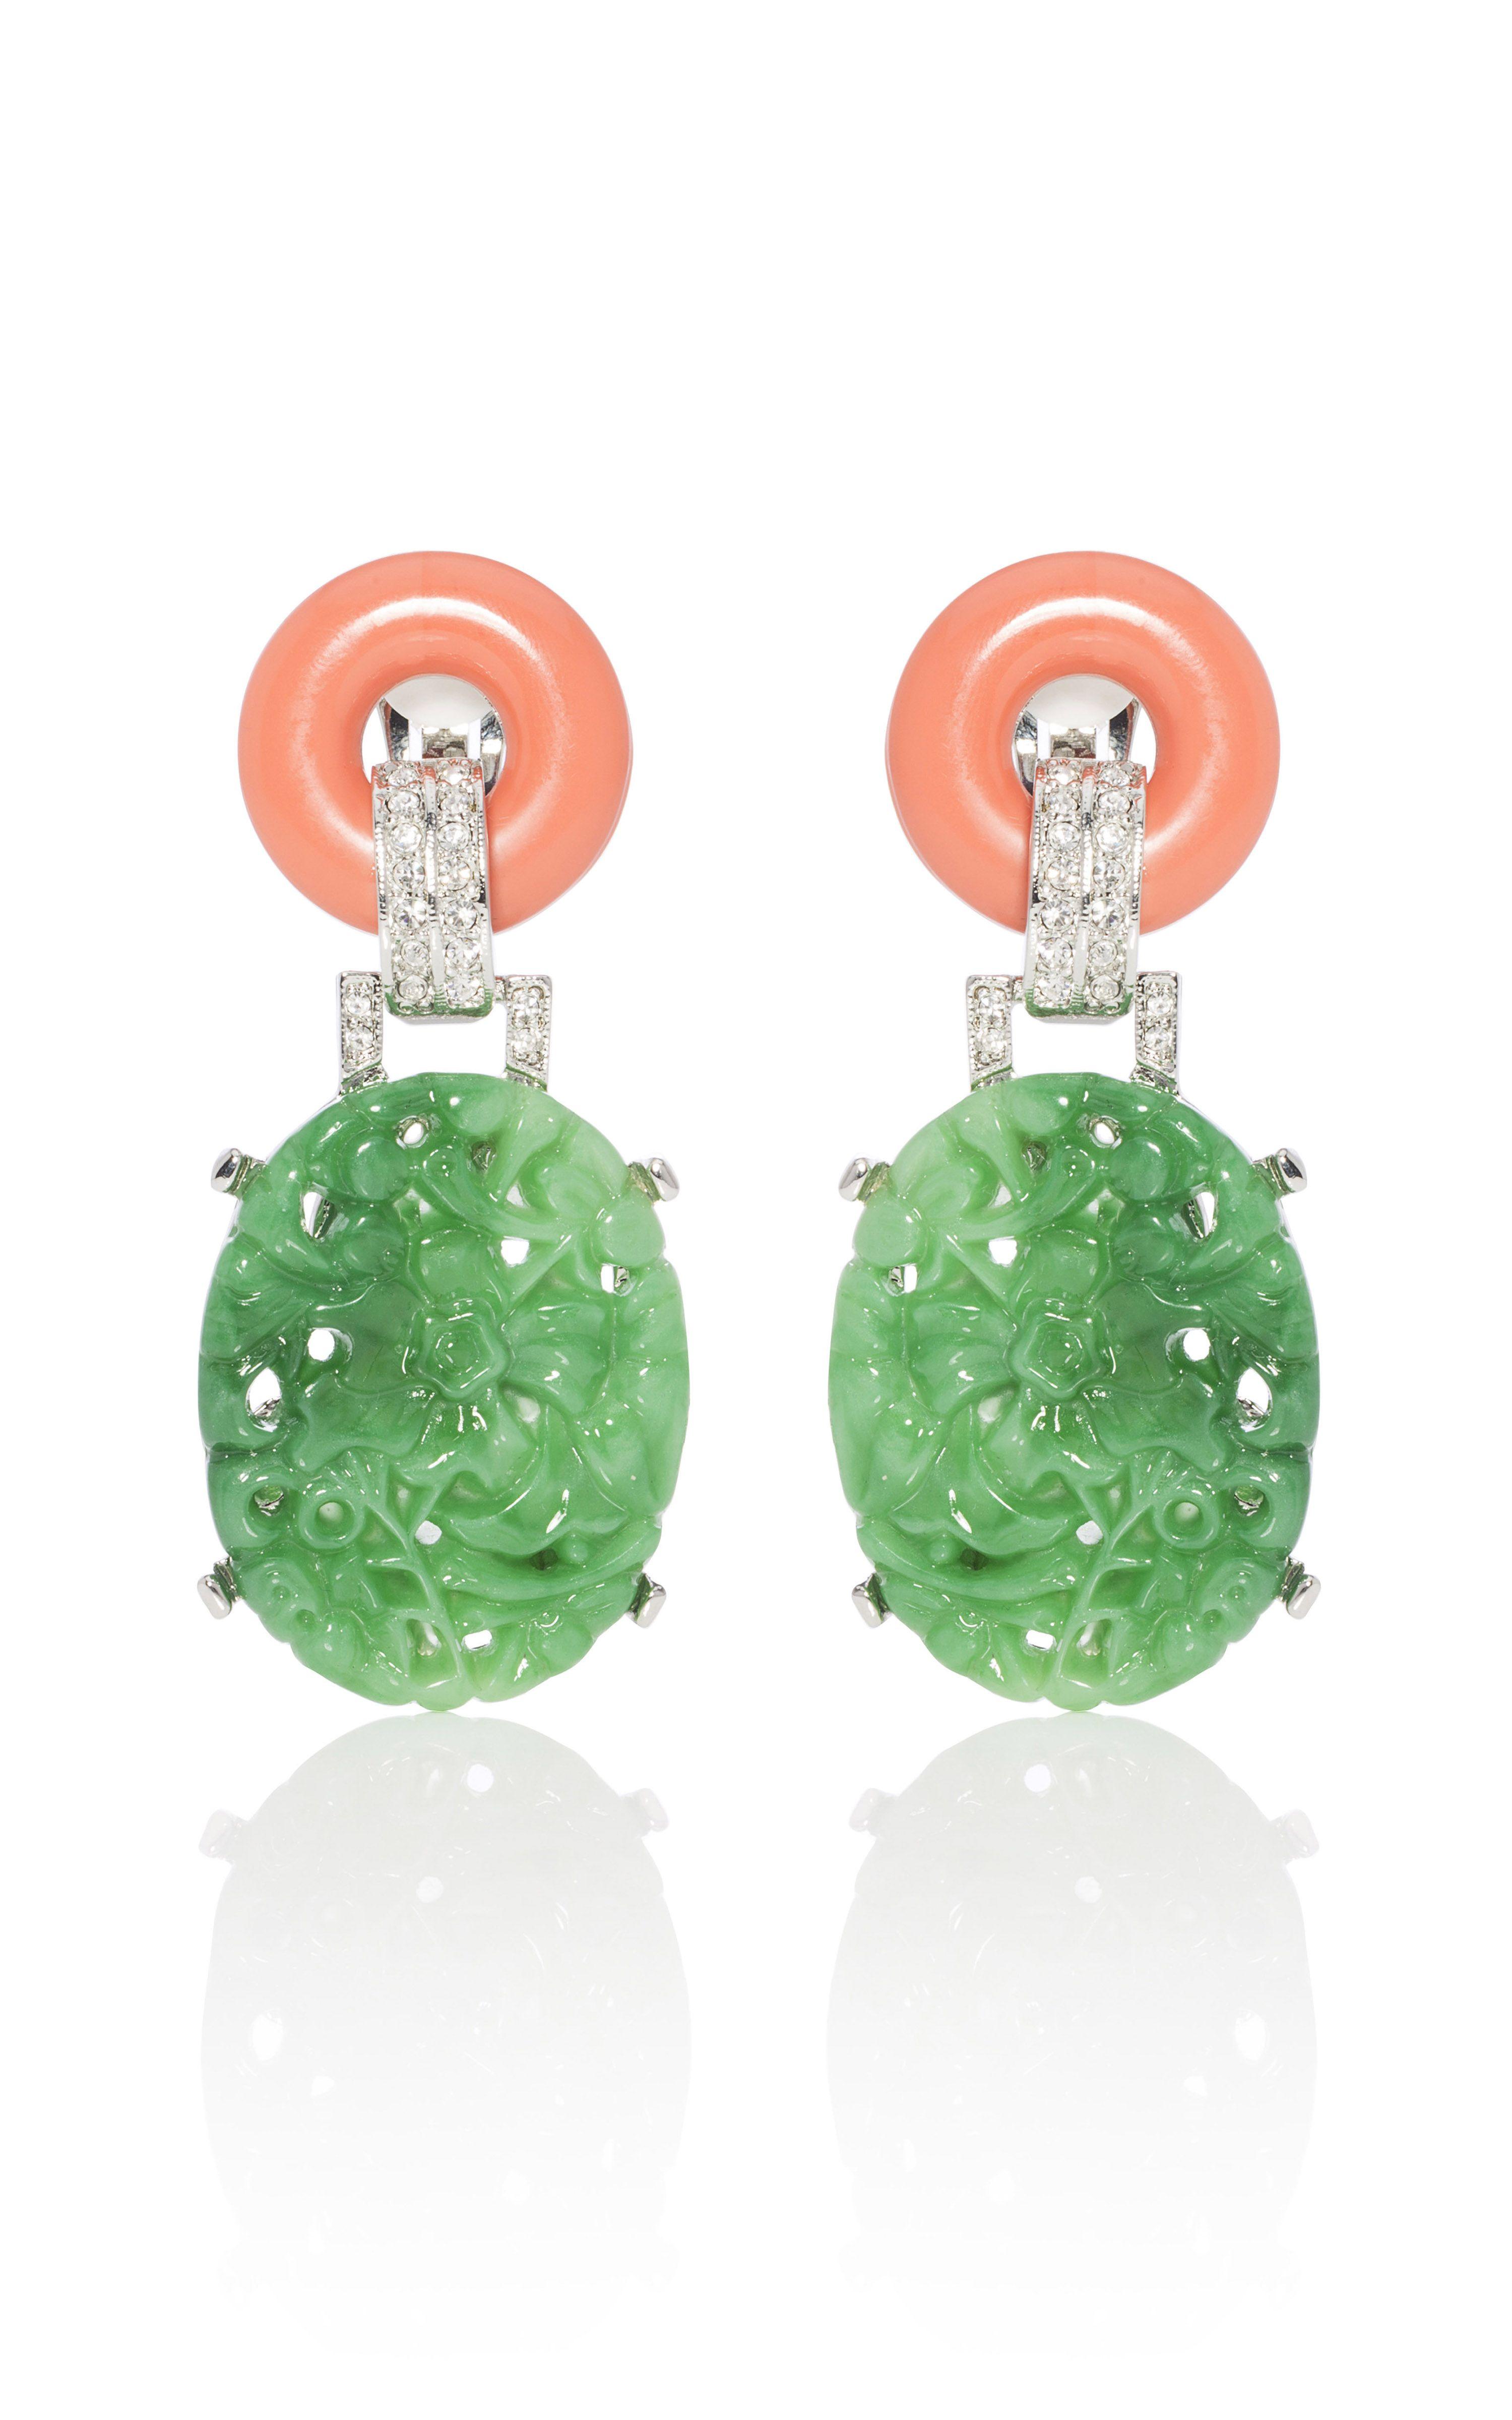 Kenneth Jay Lane Carved Jade Earrings at Moda Operandi | Jewelry ...